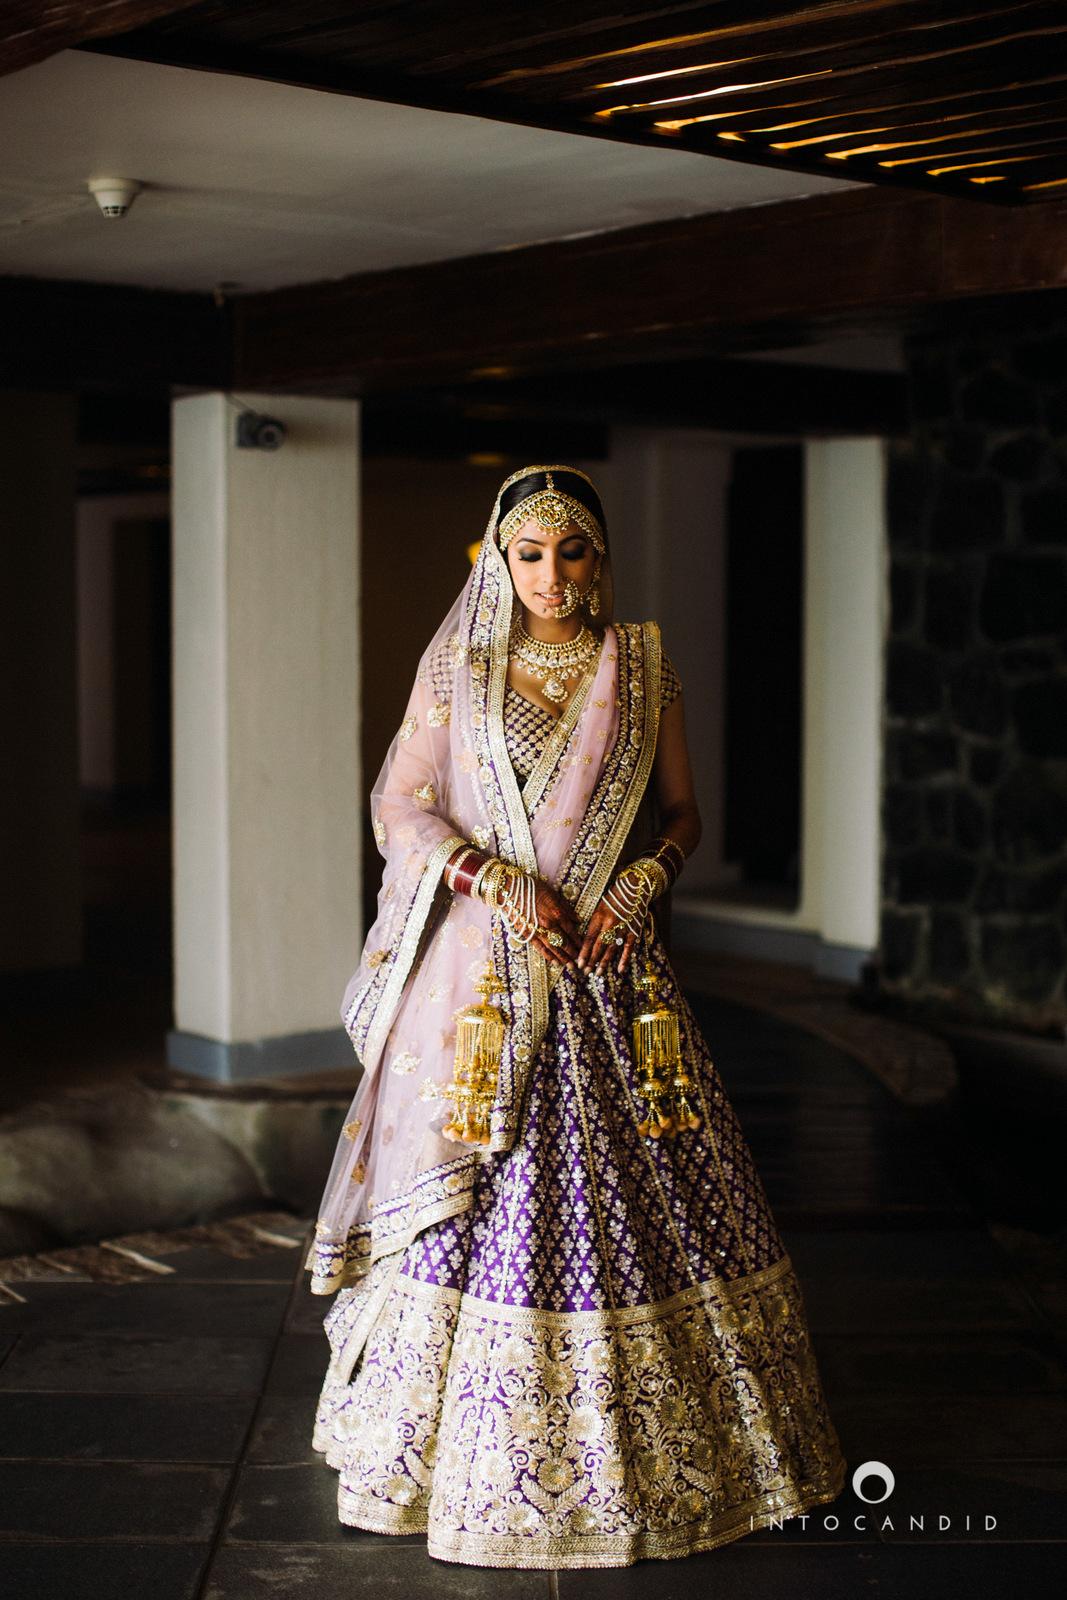 leela-kovalam-wedding-destination-indian-wedding-photography-intocandid-ra-34.jpg